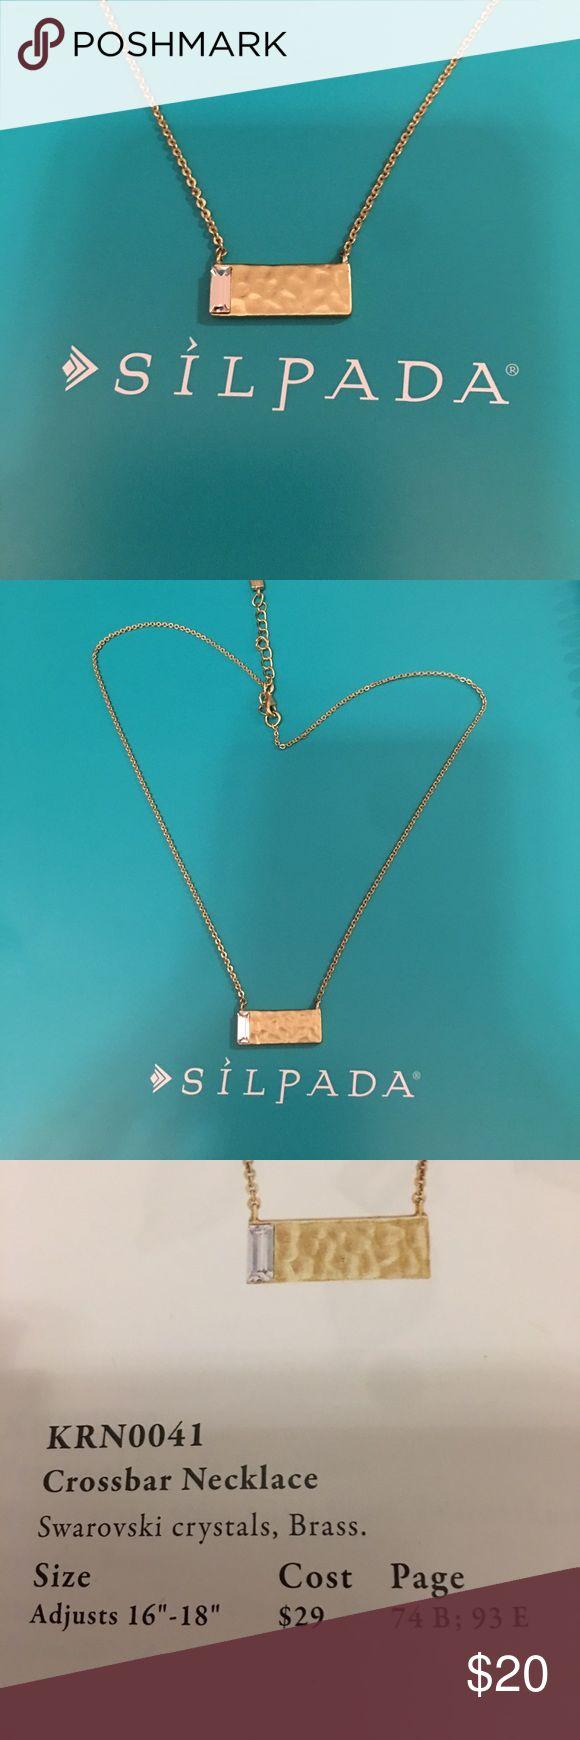 Silpada designs cross bar necklace brass Silpada designs cross bar necklace brass Silpada Jewelry Necklaces